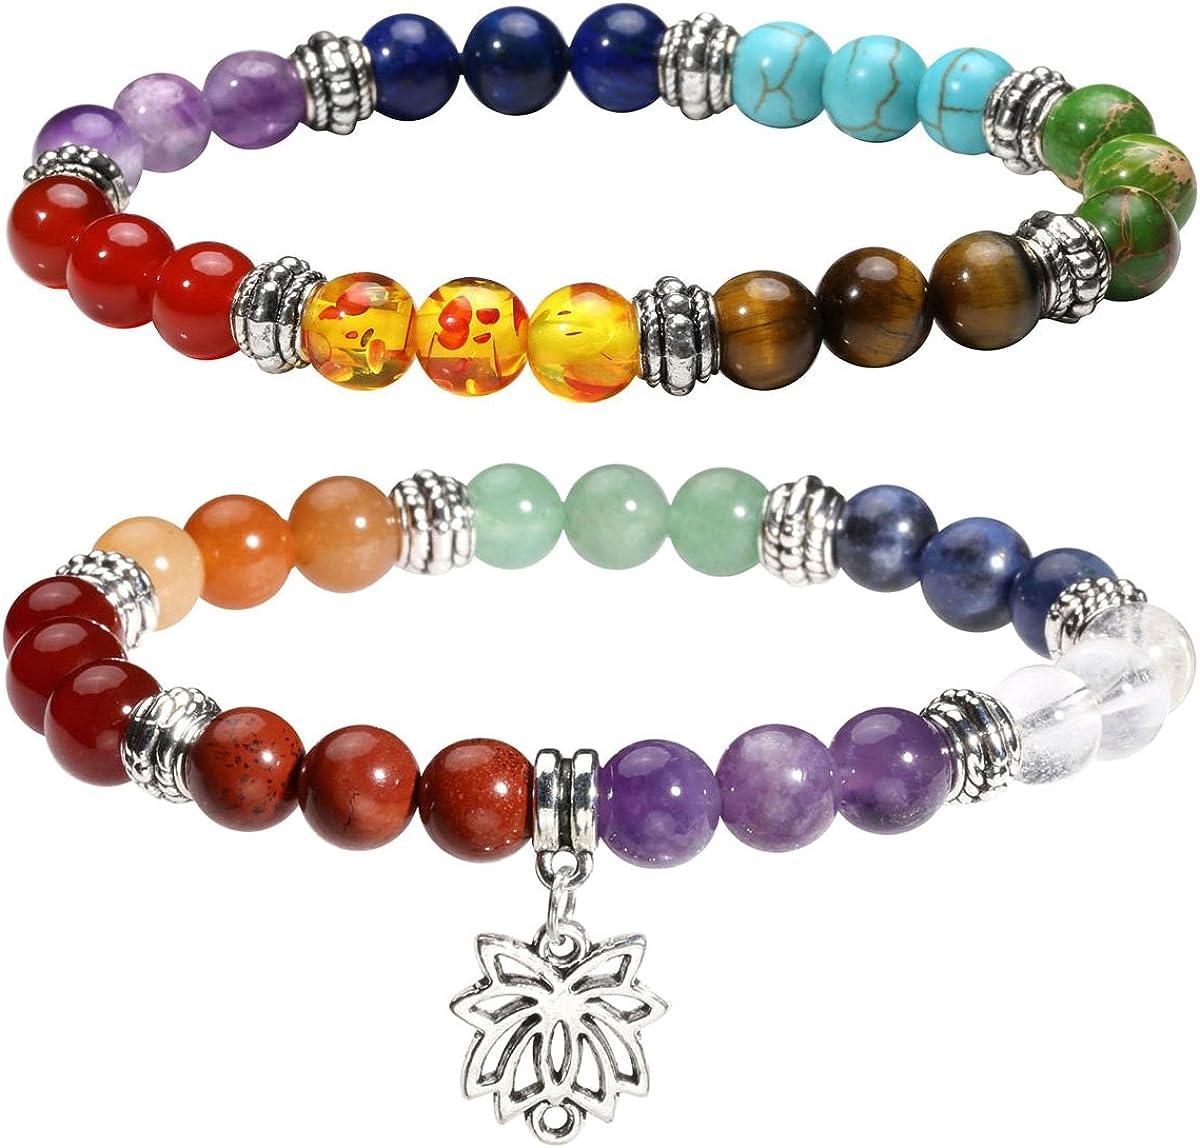 Eigso 7 Chakra Womens Reiki Healing Meditation Crystal Stone Stretch Bracelet with Lotus/Yoga/Tree/OM Symbol Sign